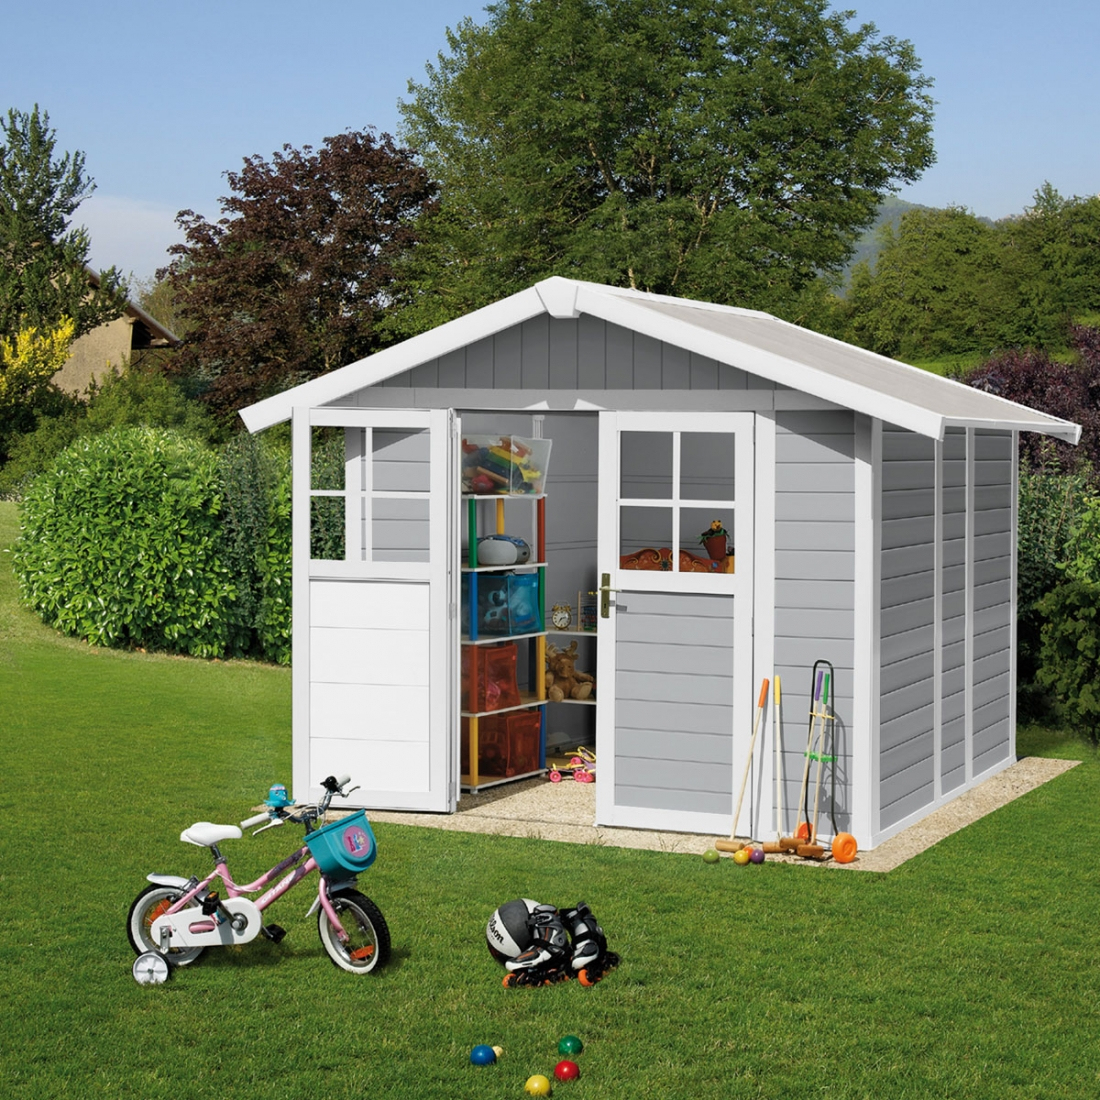 Abri De Jardin Pvc Grosfillex Deco 4,9 - Zendart Design pour Abris De Jardin Grosfillex